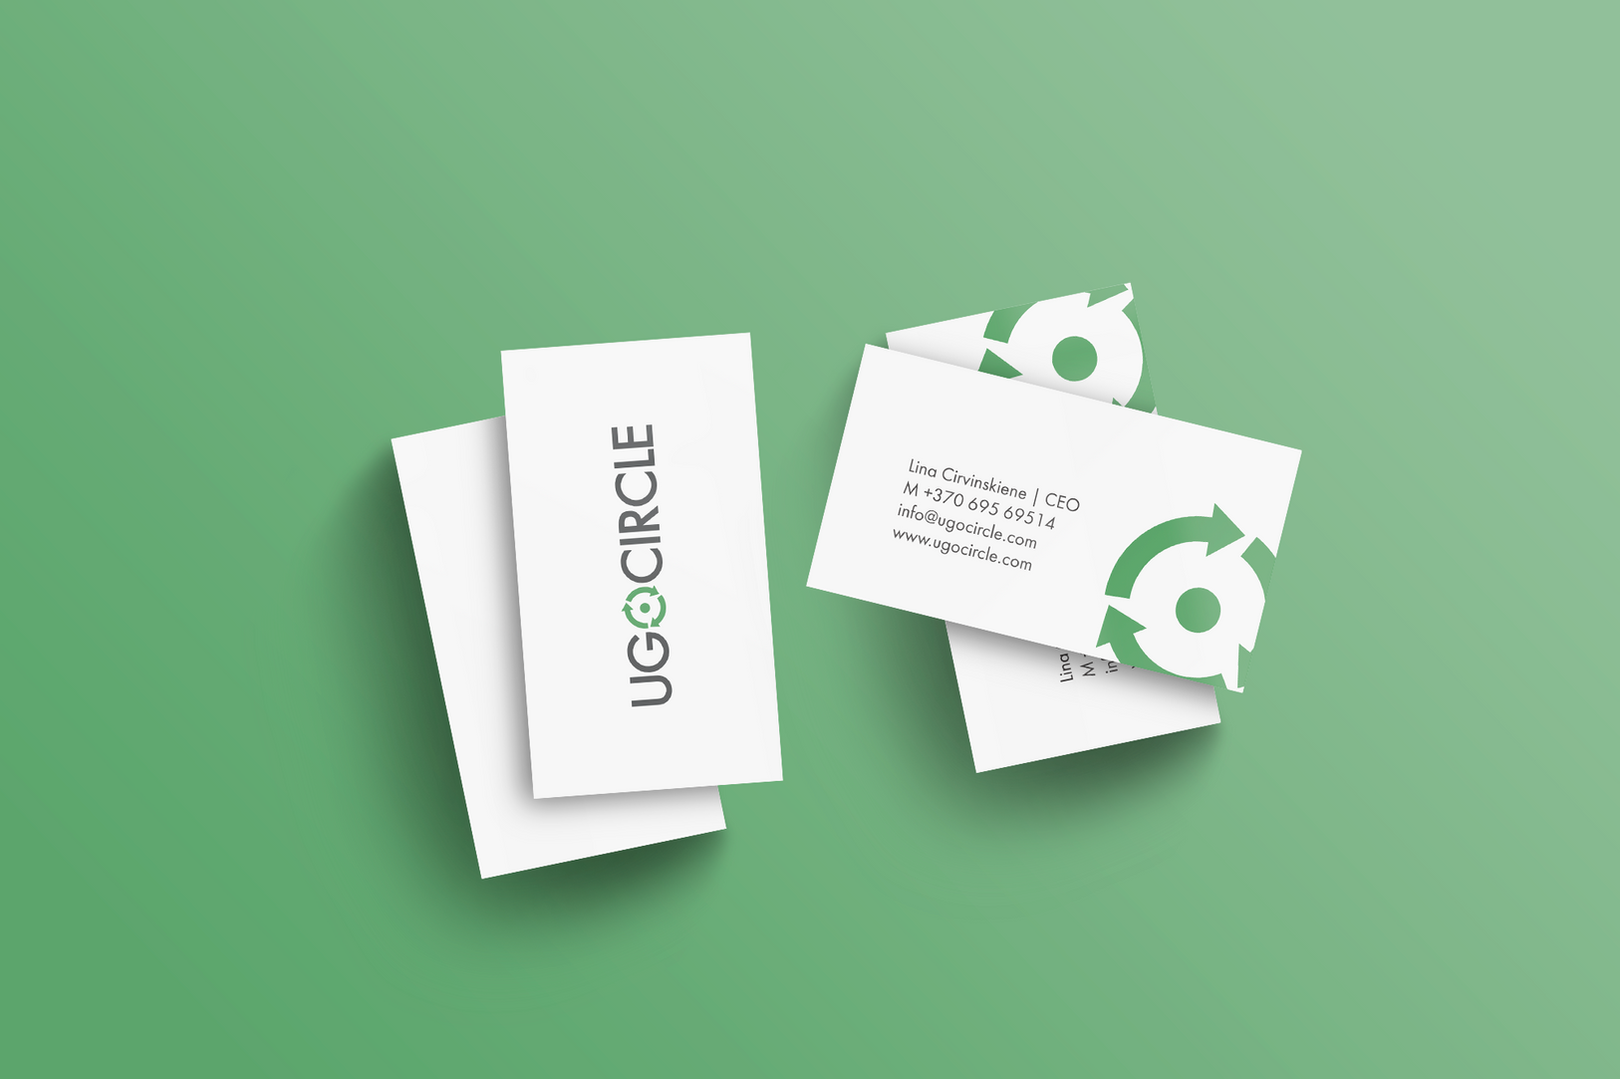 uGoCircle business card